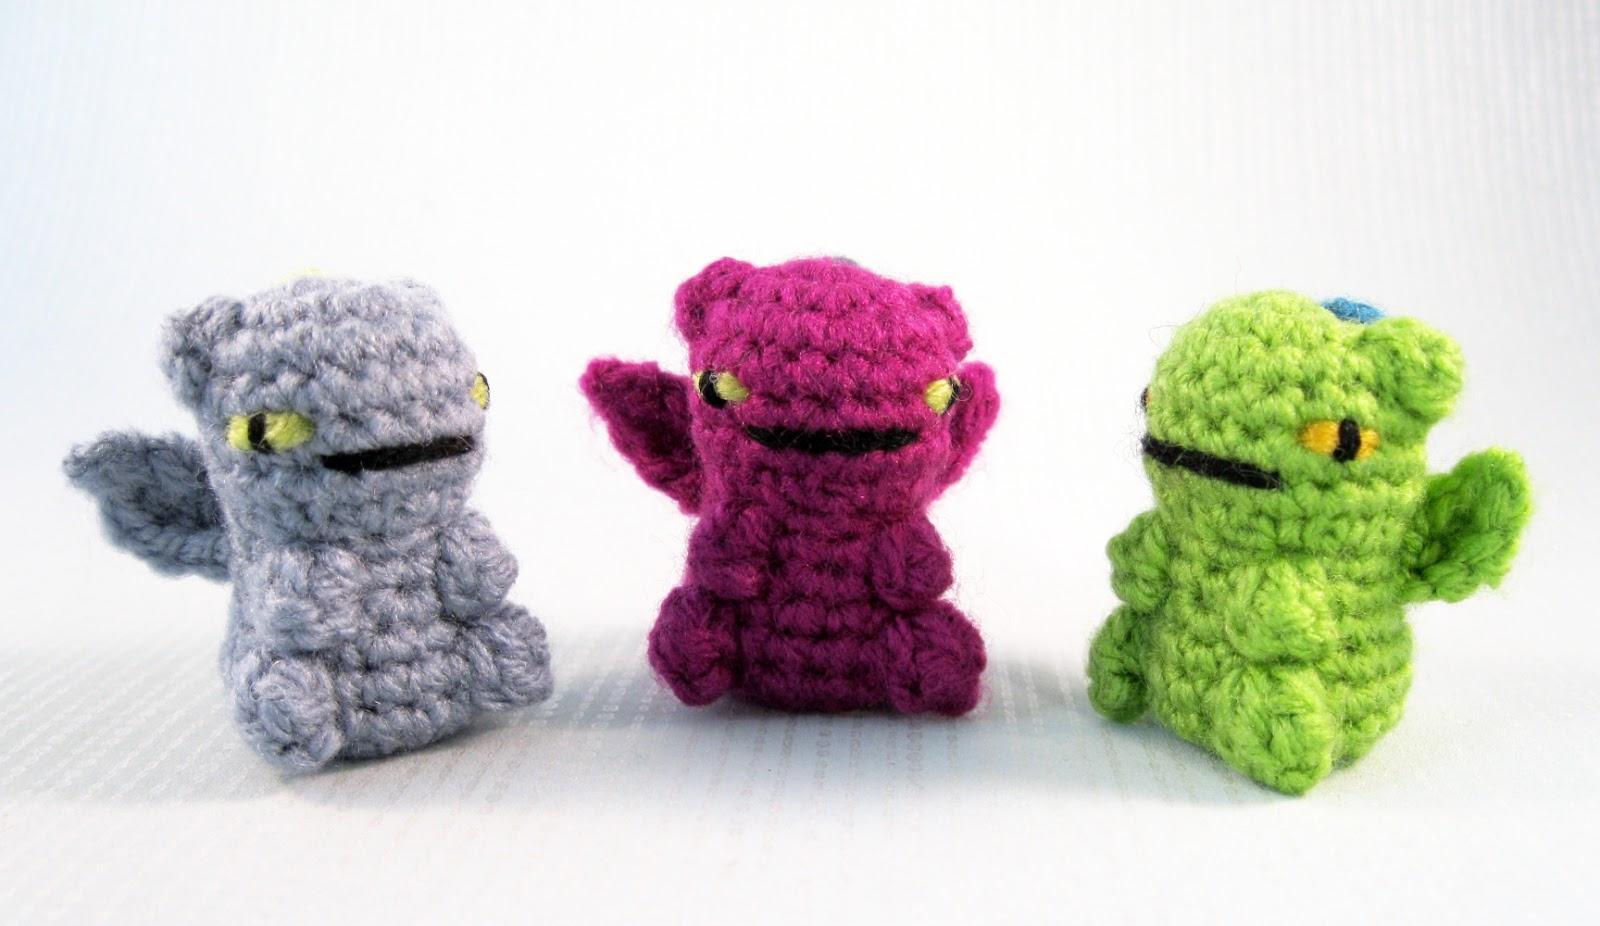 Amigurumi Dragon Egg : LucyRavenscar - Crochet Creatures: Mini Pets in Eggs ...